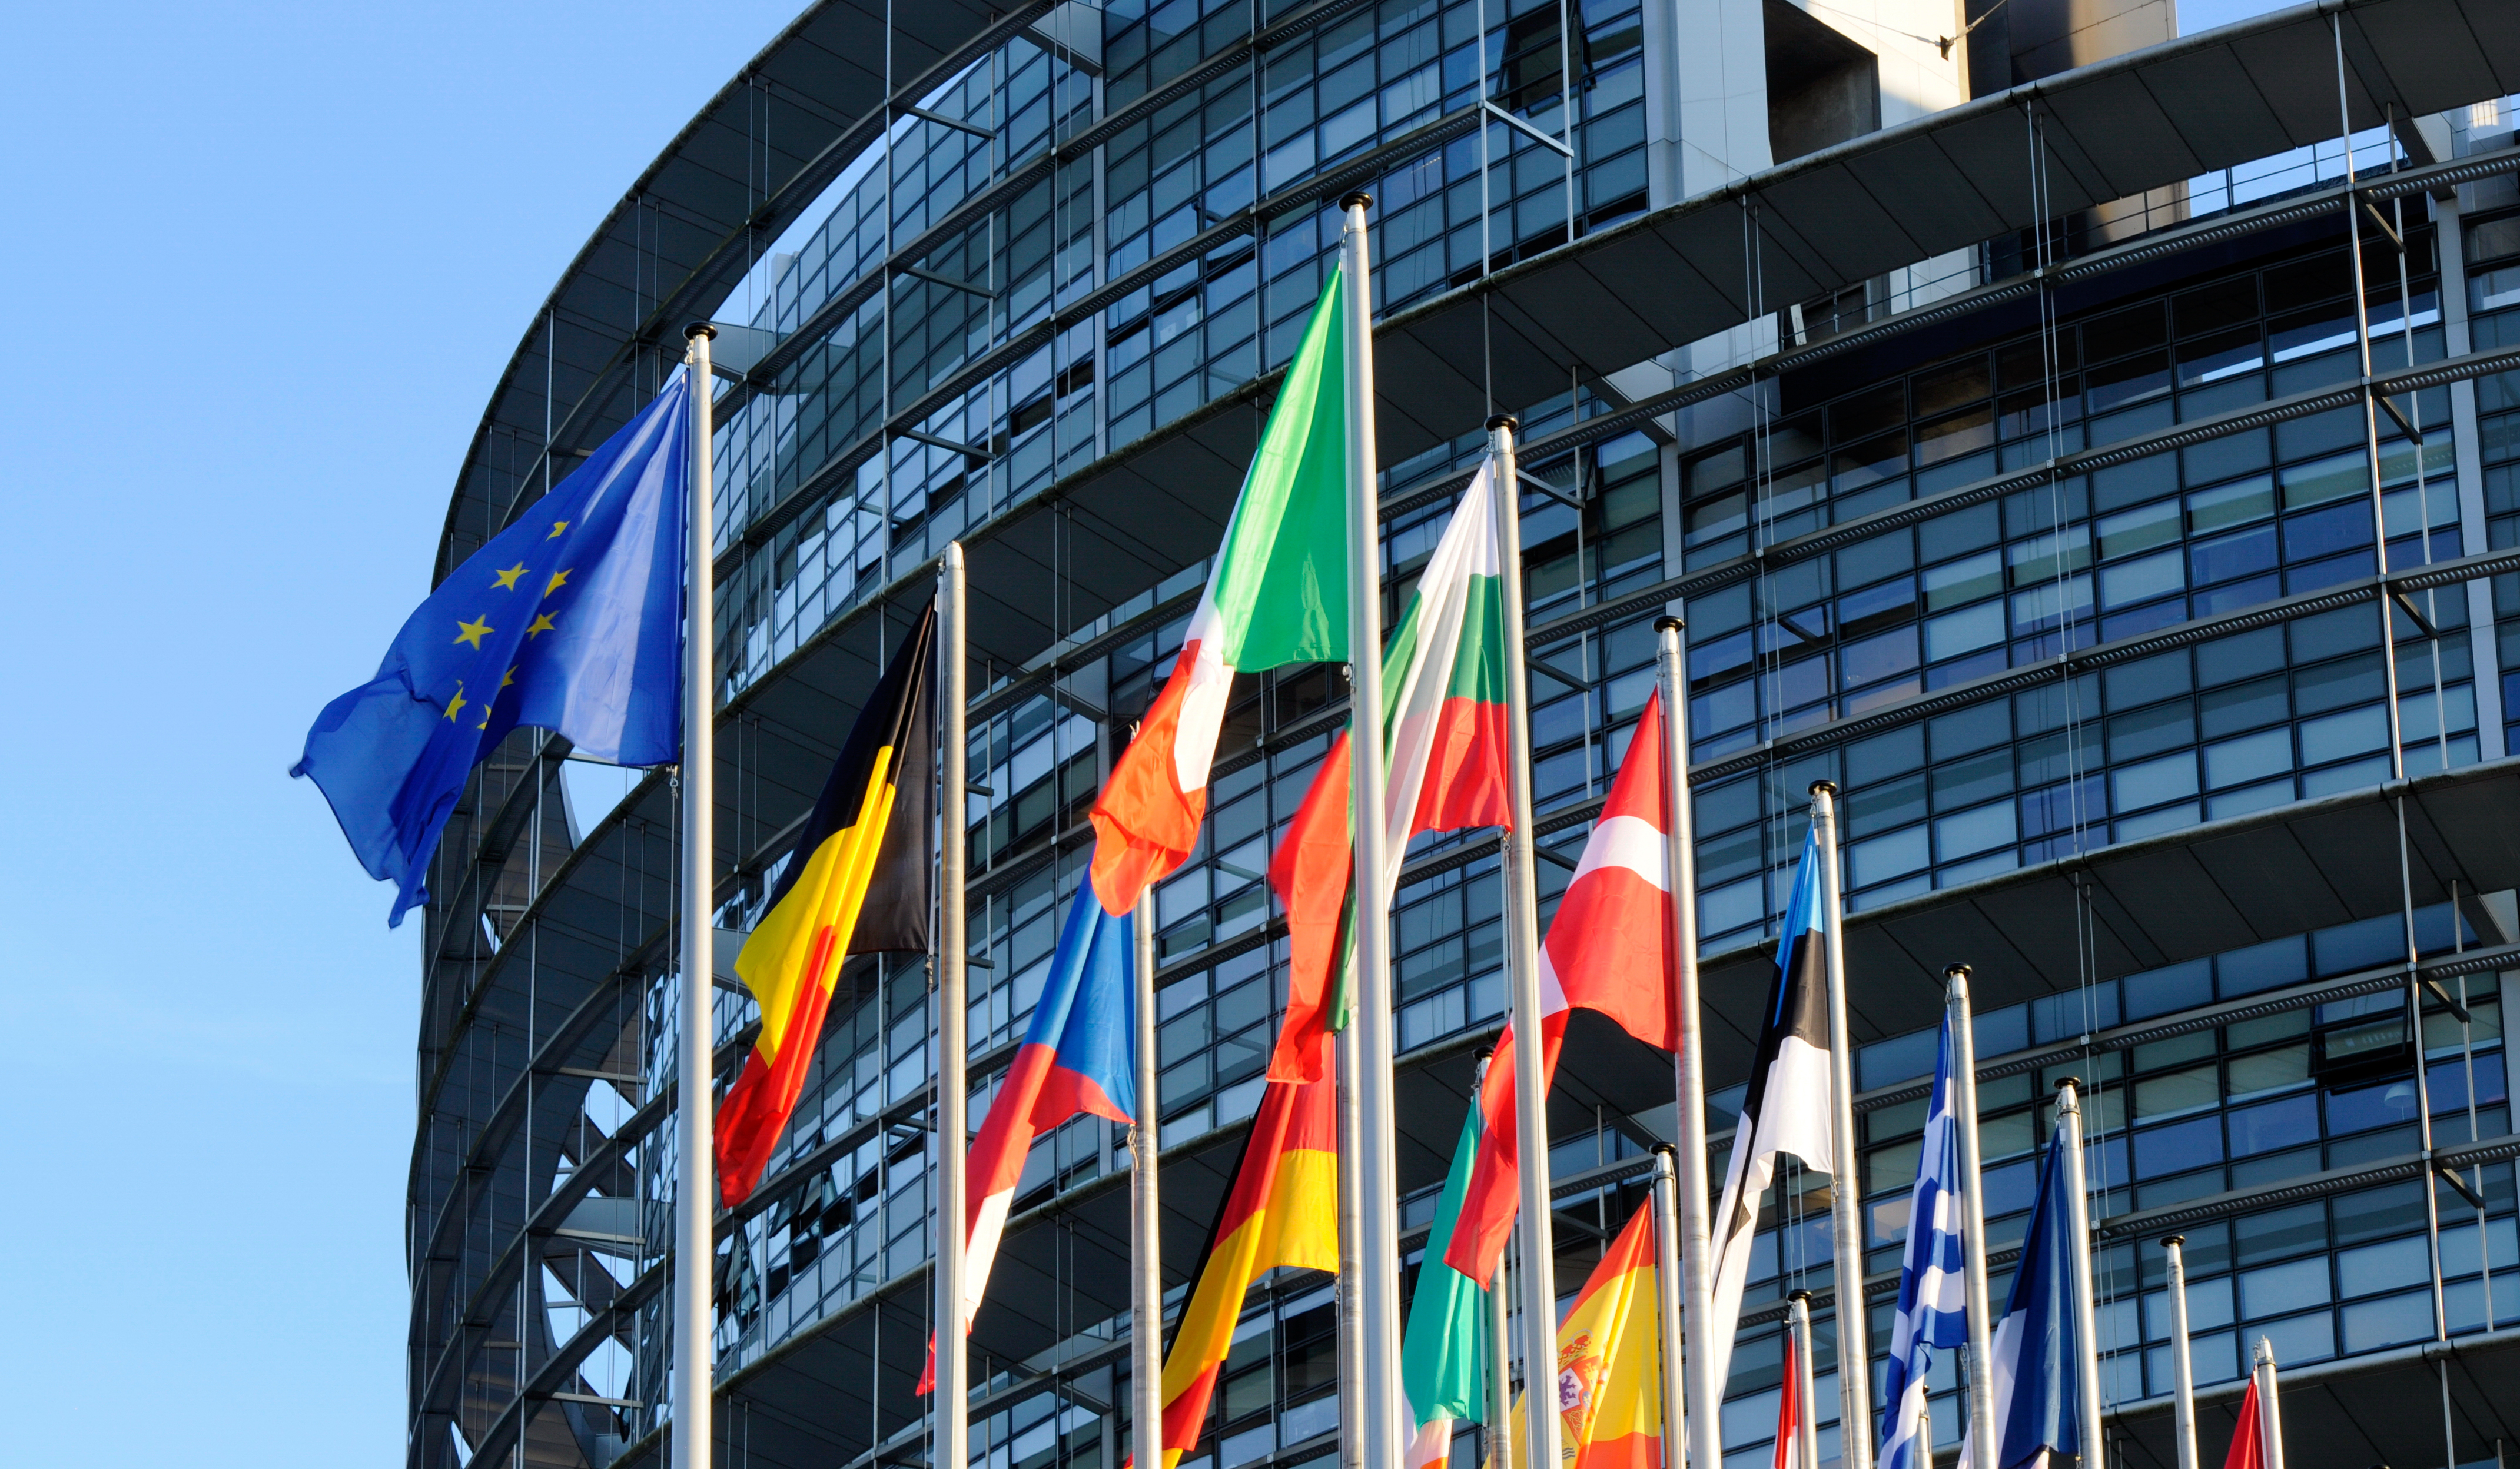 Parlement européenne